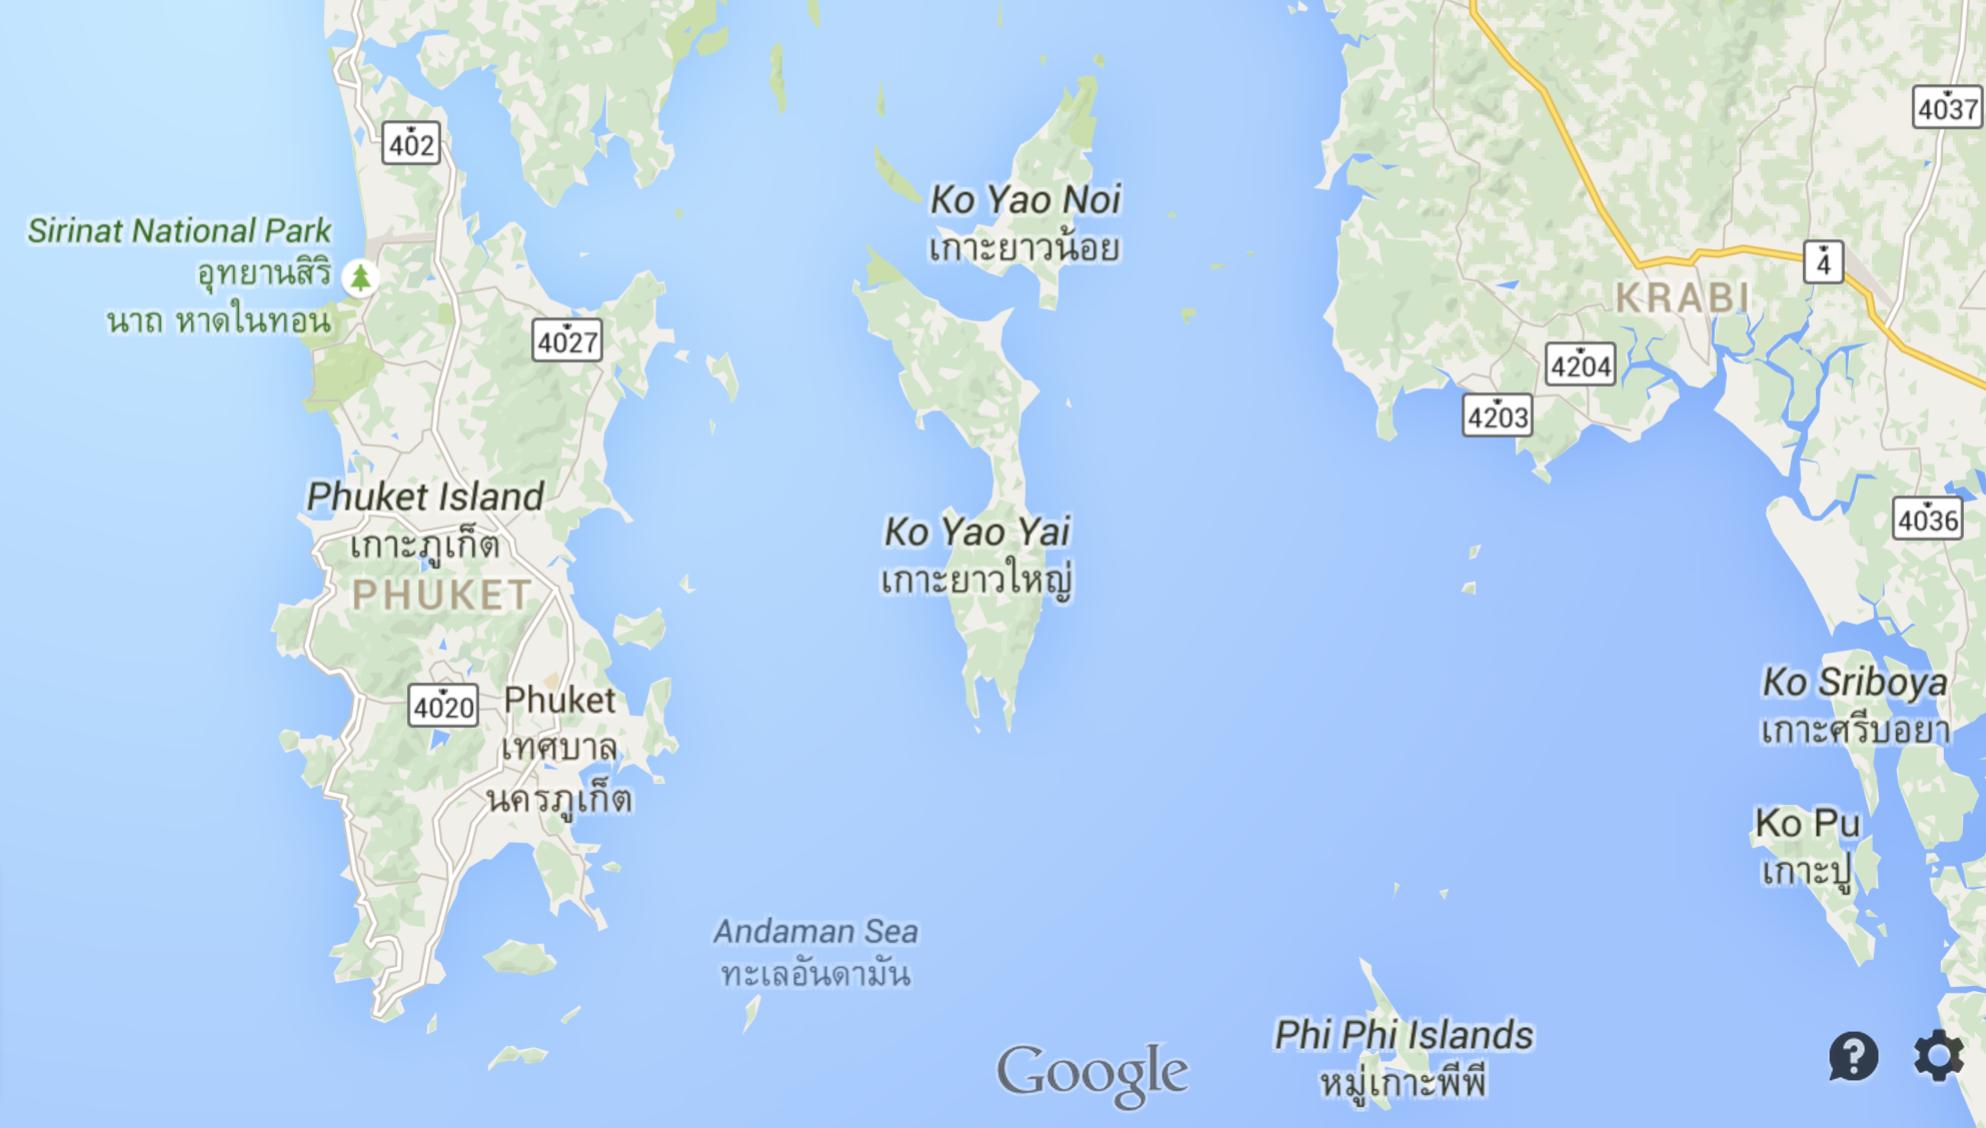 Google map of phuket thailand adrian video image google map of phuket thailand gumiabroncs Images